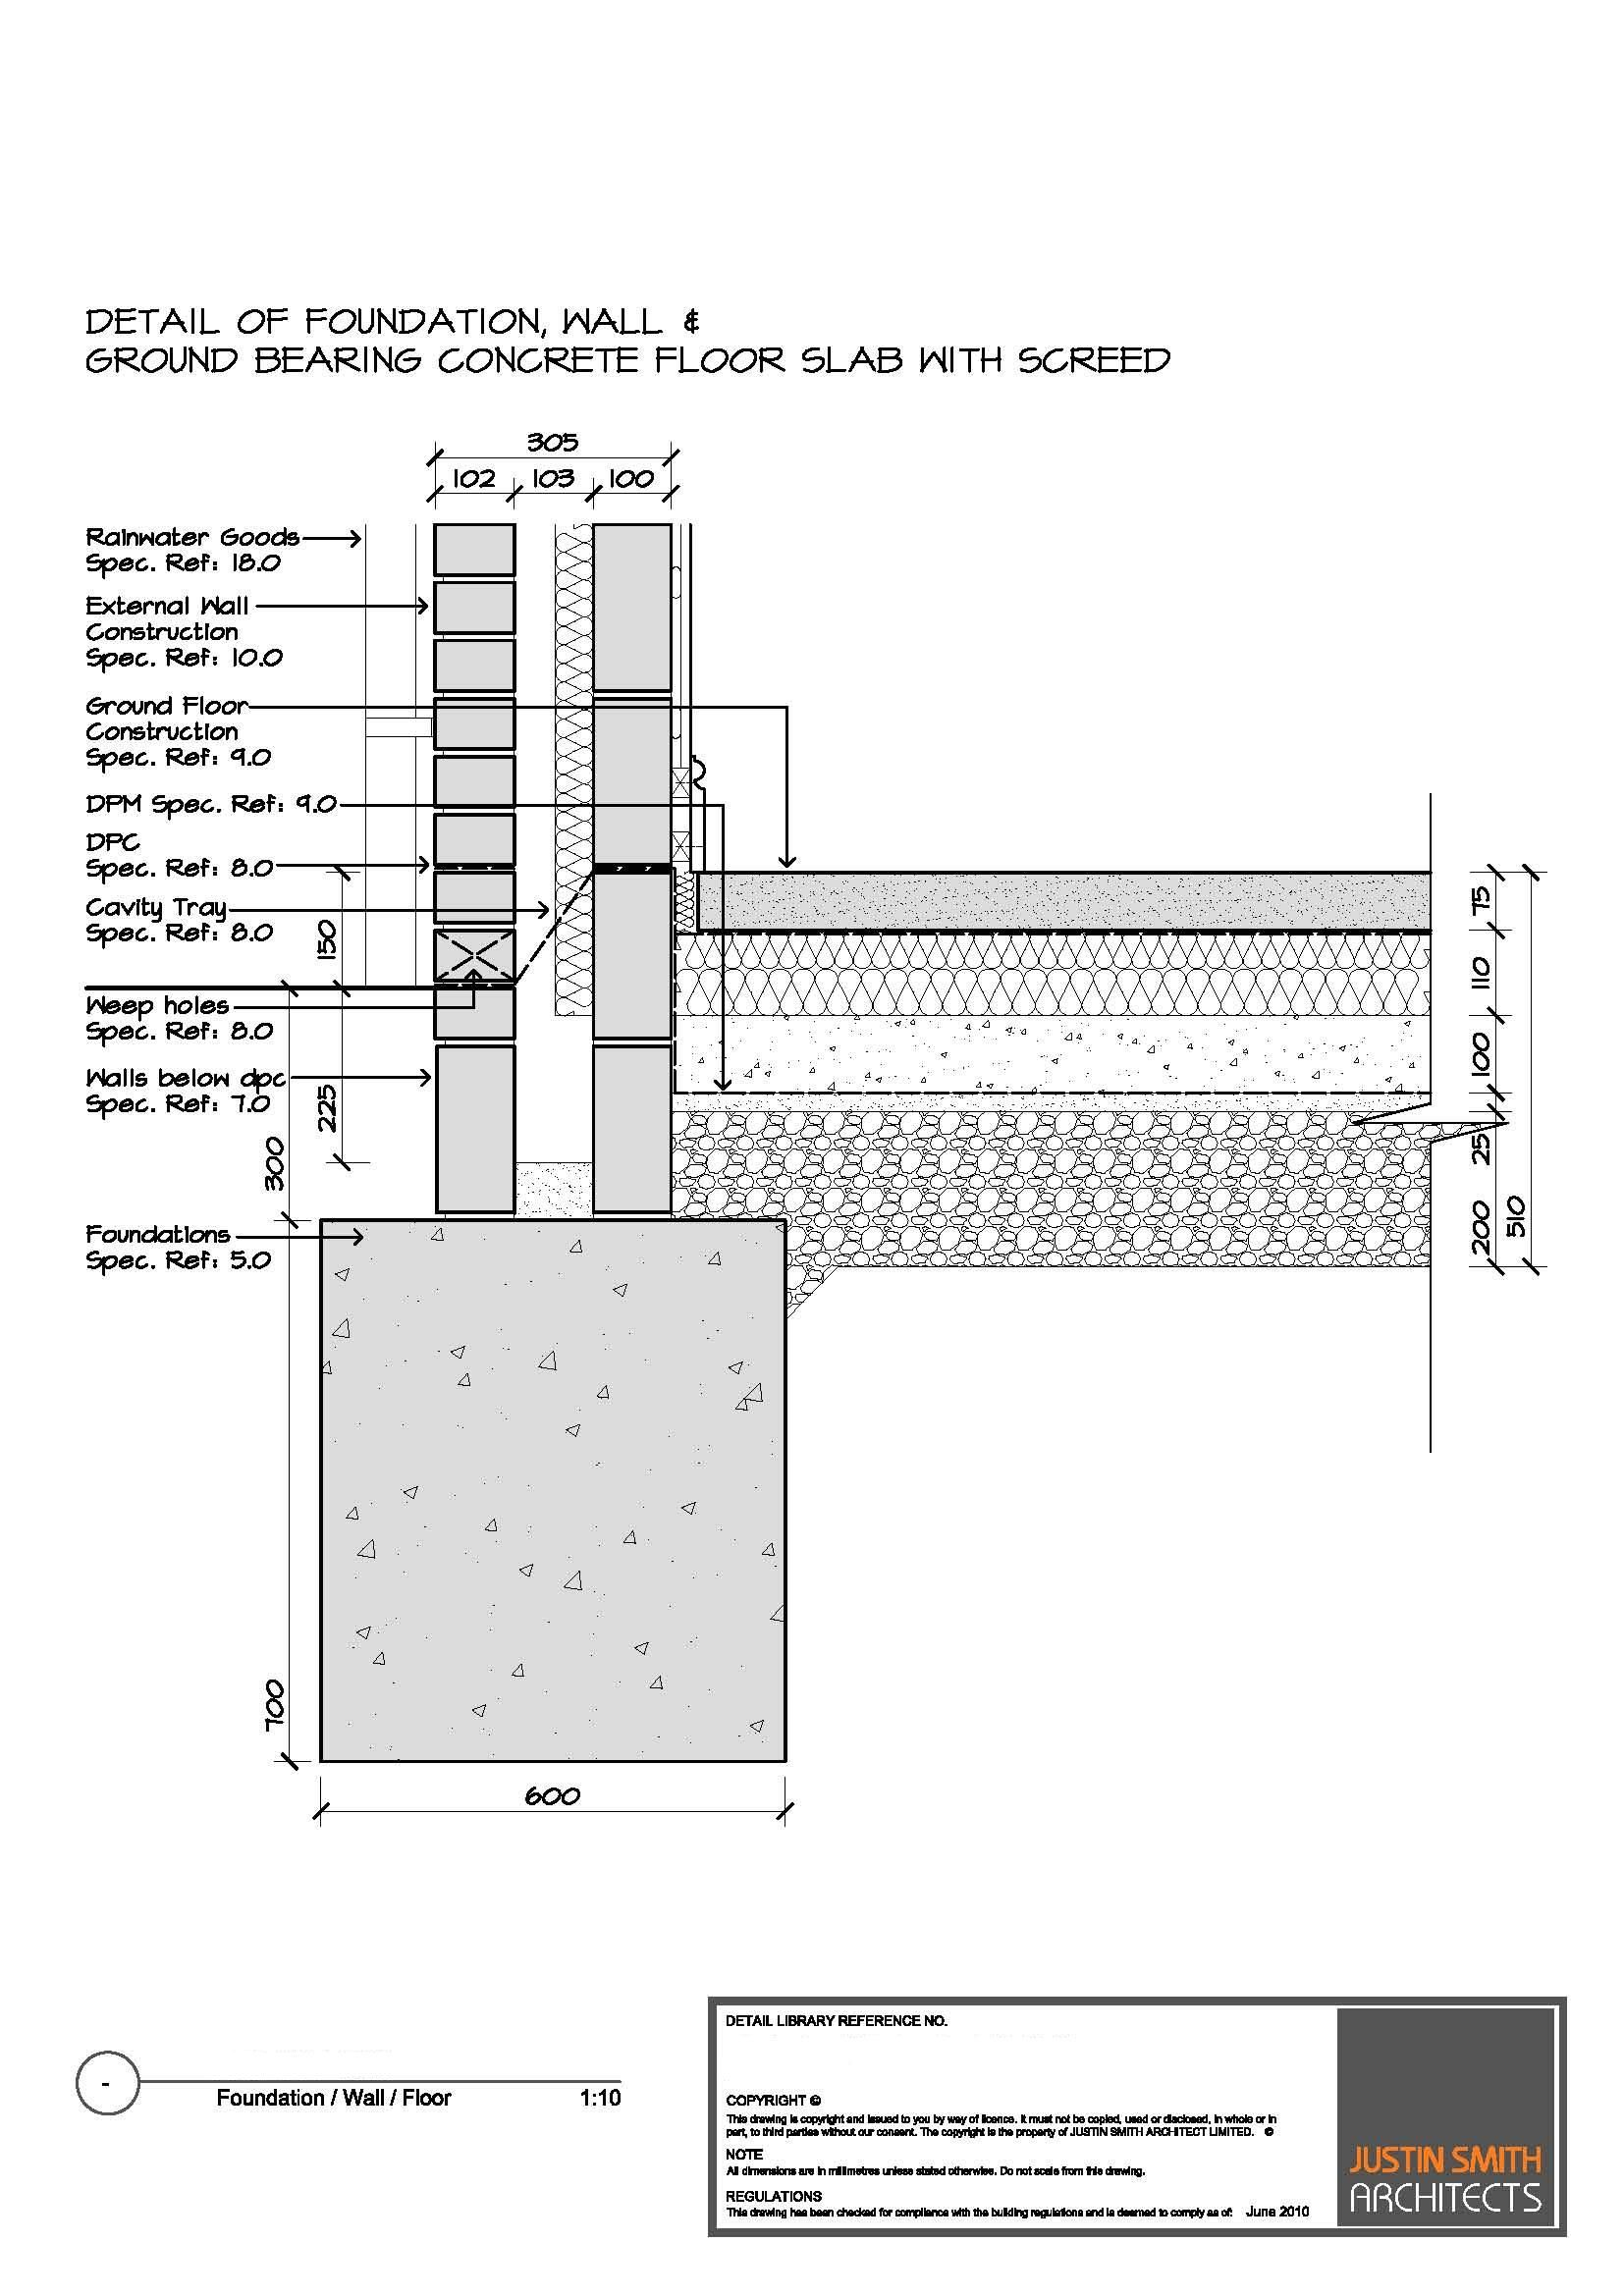 Architectural Plans | Arch | DeTAILs draWn | Architecture ...